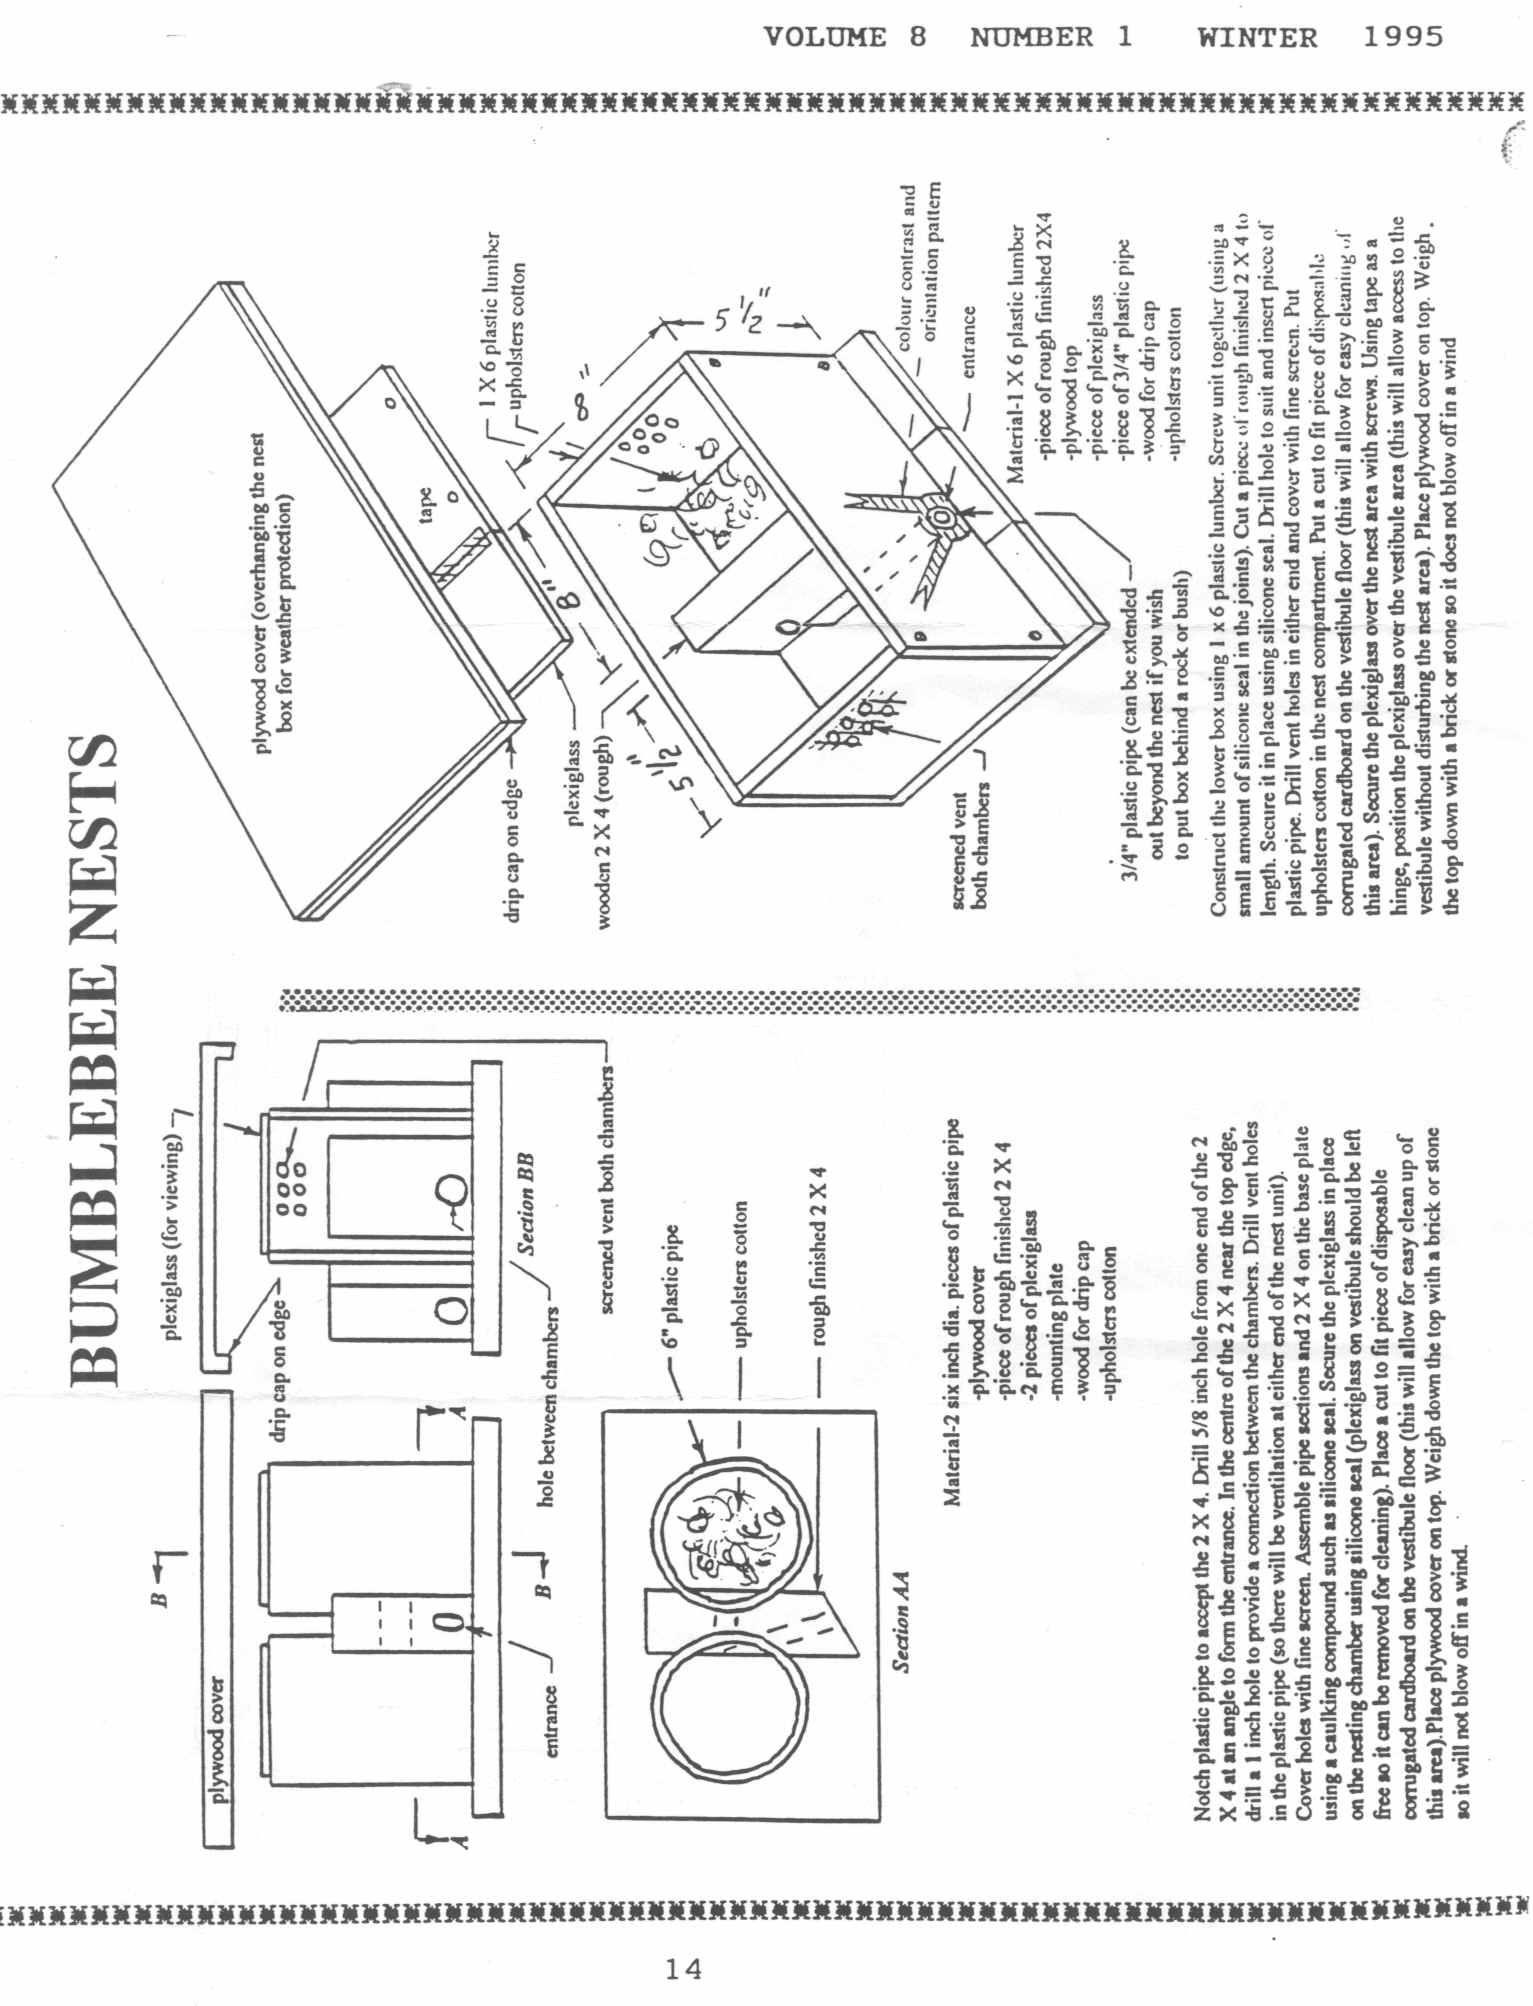 Bumble Beeus Nest Box Plan